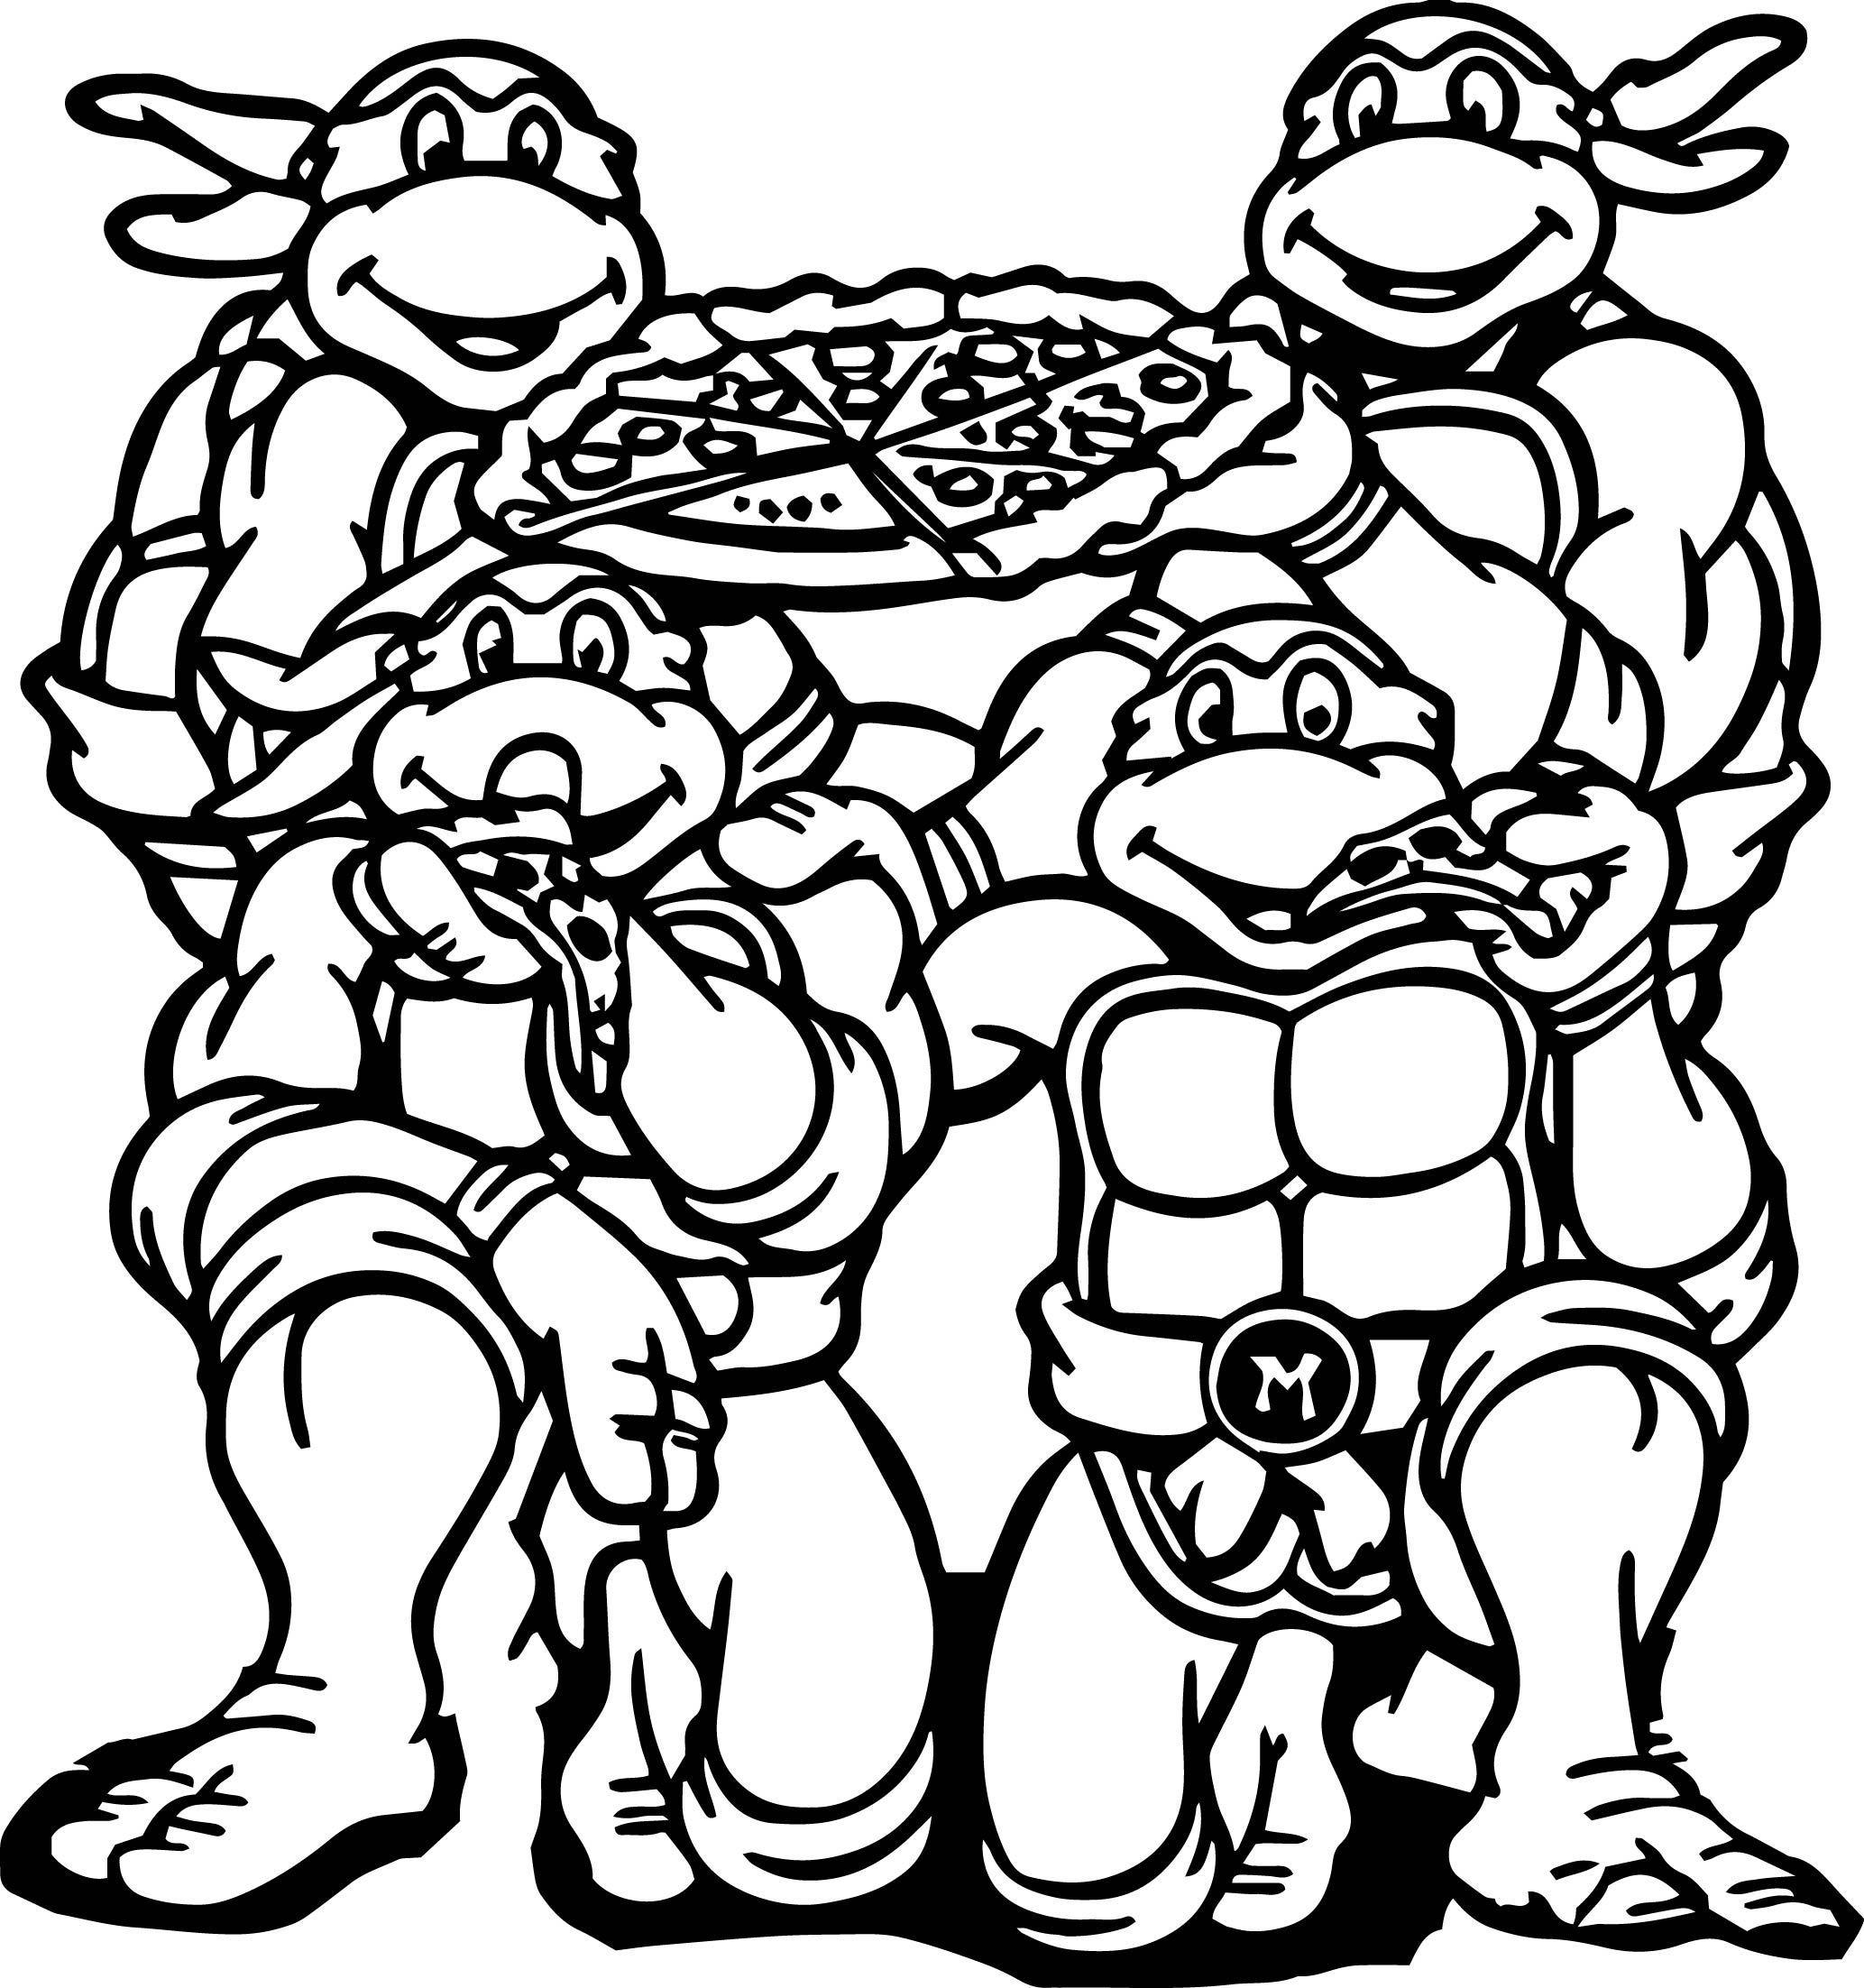 2067x2204 Fresh Teenage Mutant Ninja Turtle Coloring Pages Page Turtles Nick